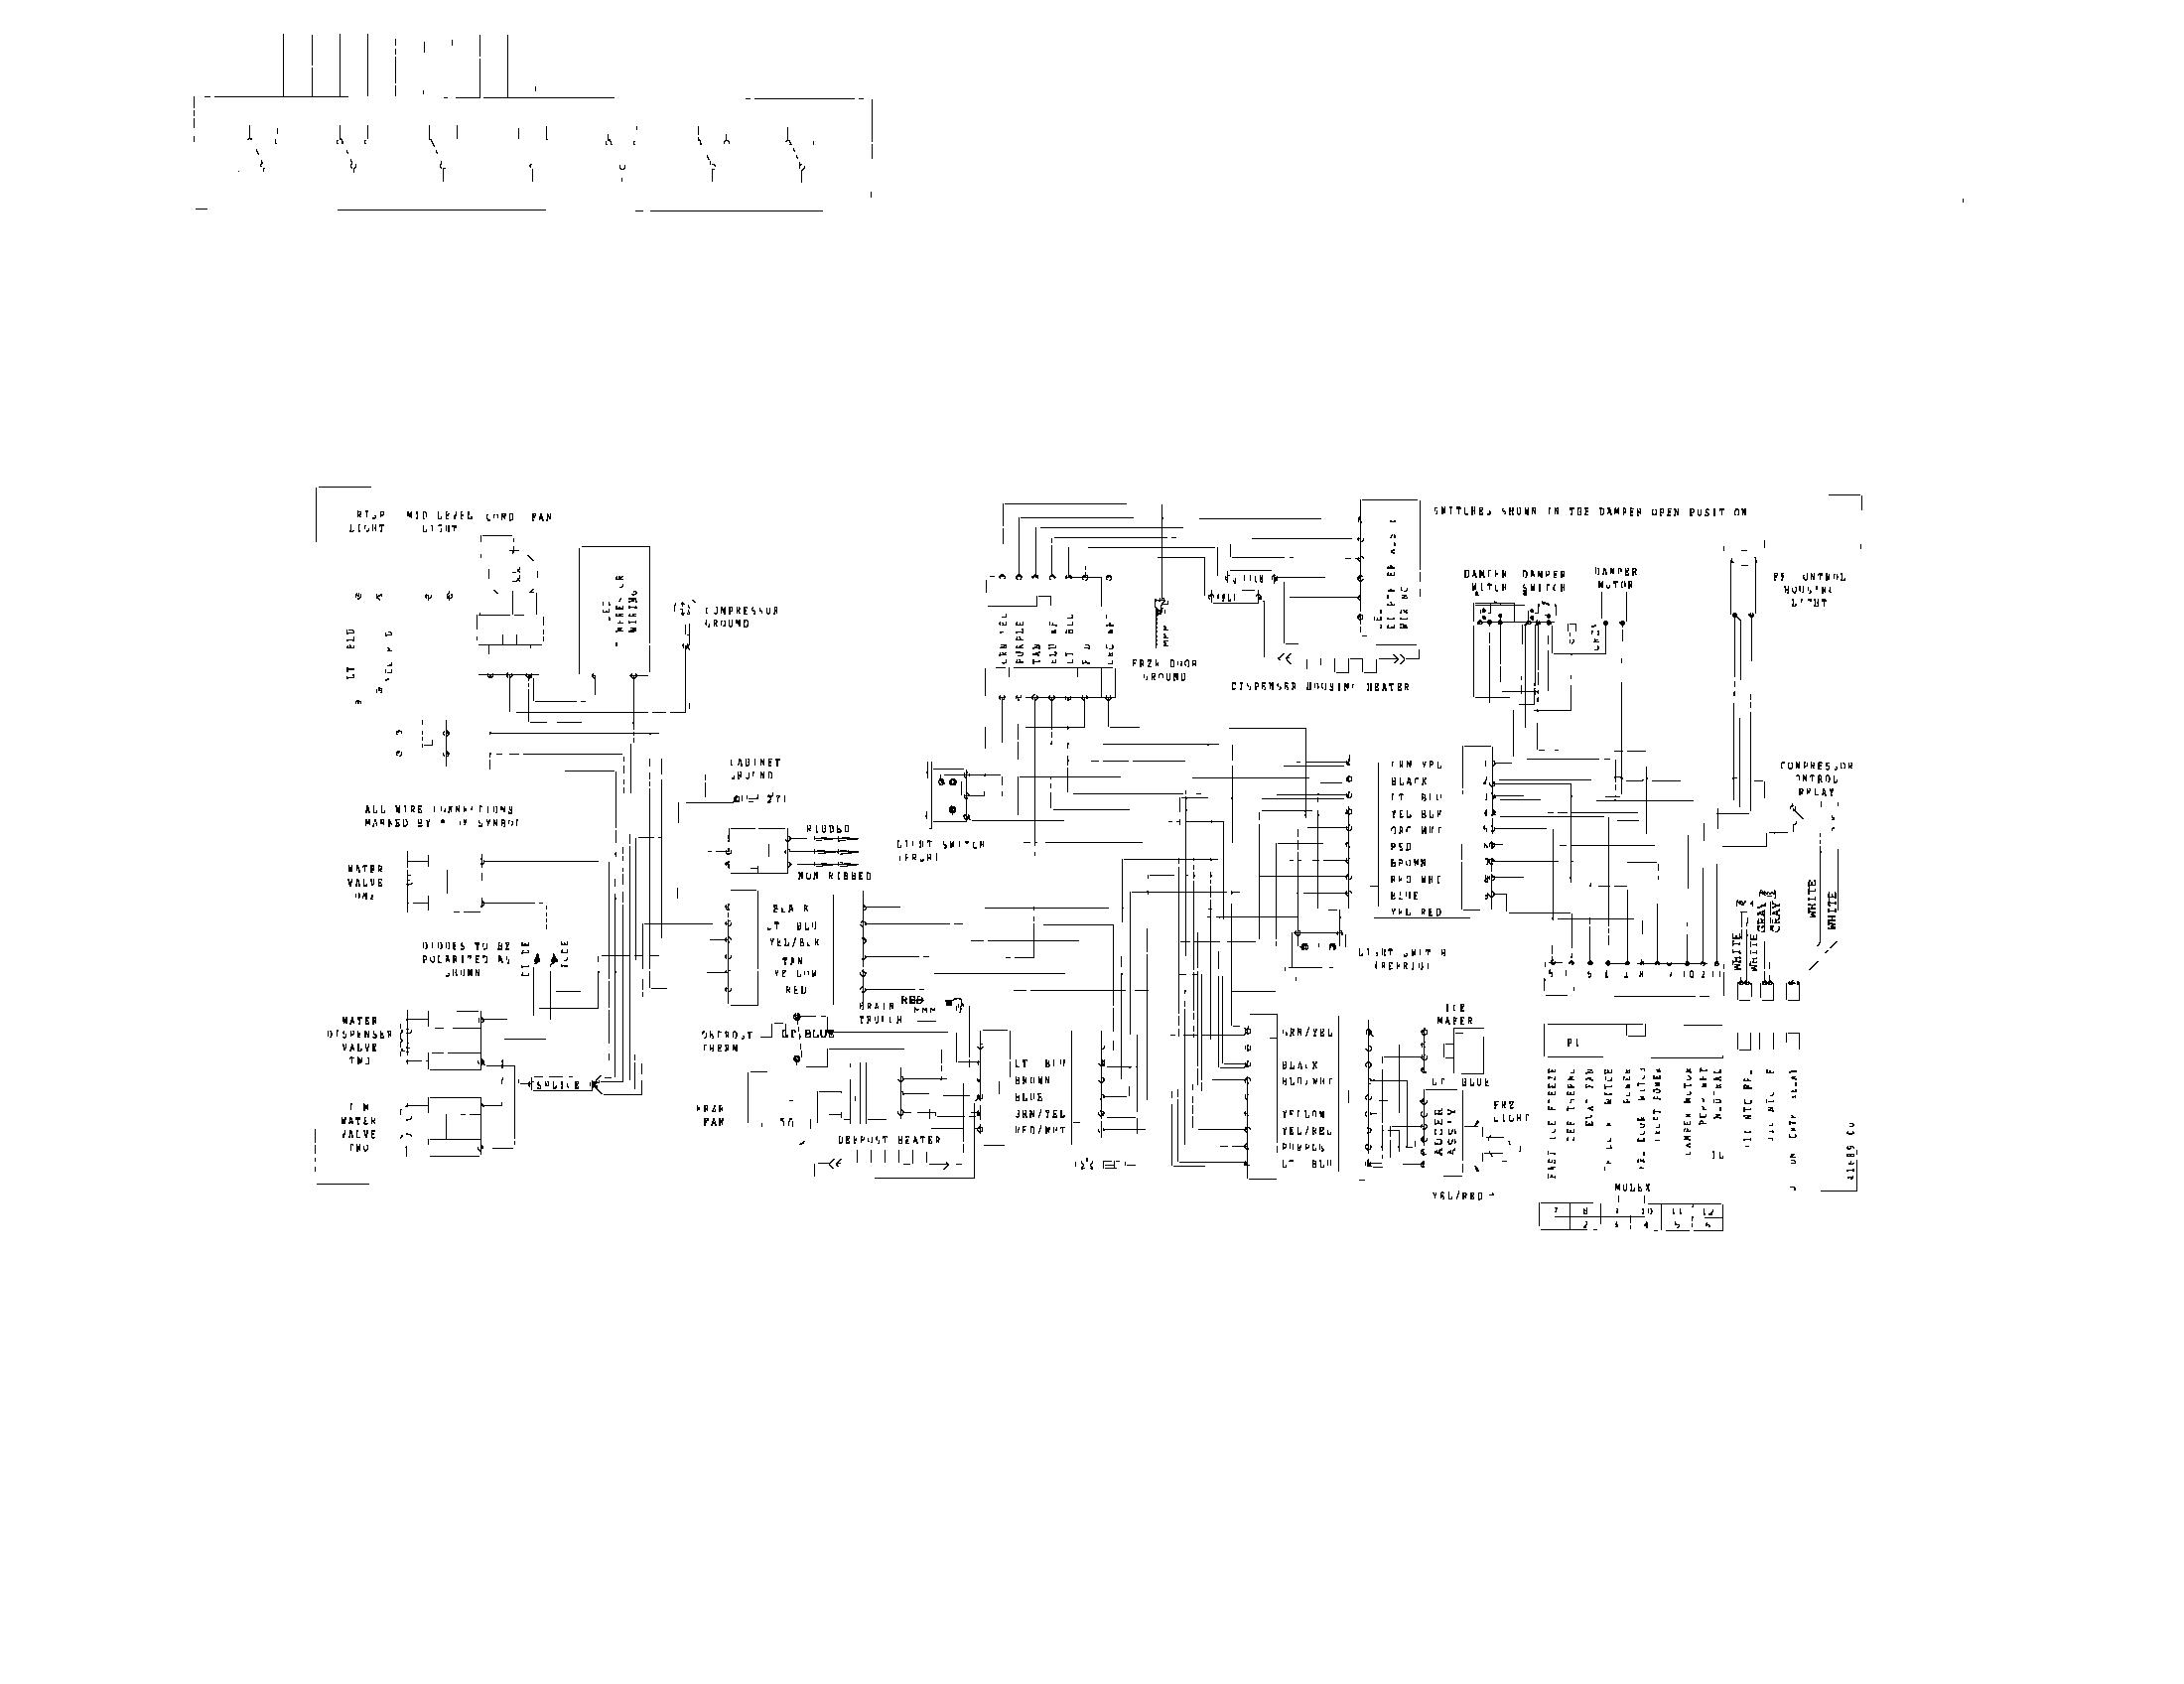 Kenmore Refrigerator Wiring Diagram - Wiring Liry Diagram A5 on